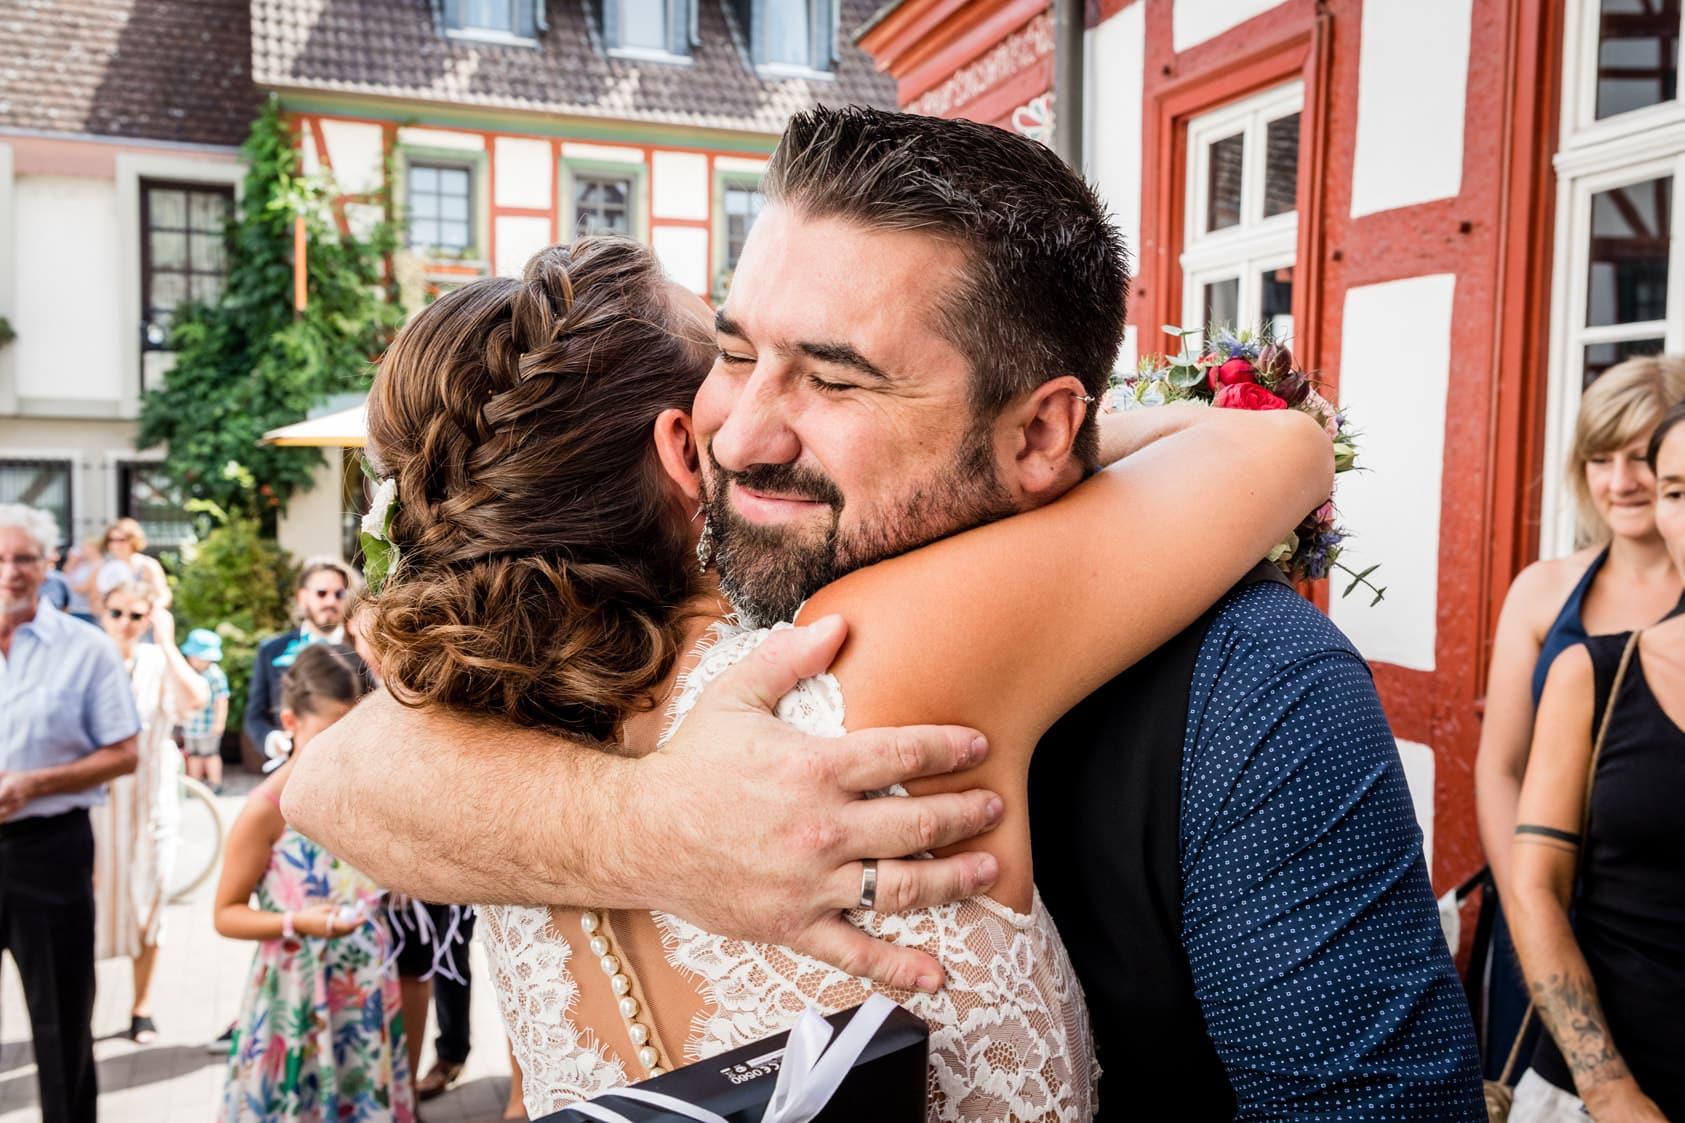 hochzeitsfotograf-darmstadt-mainz-wiesbaden-standesamt-grossgerau-vintage-boho-doityourself-wedding-heiraten-fotograf-catering